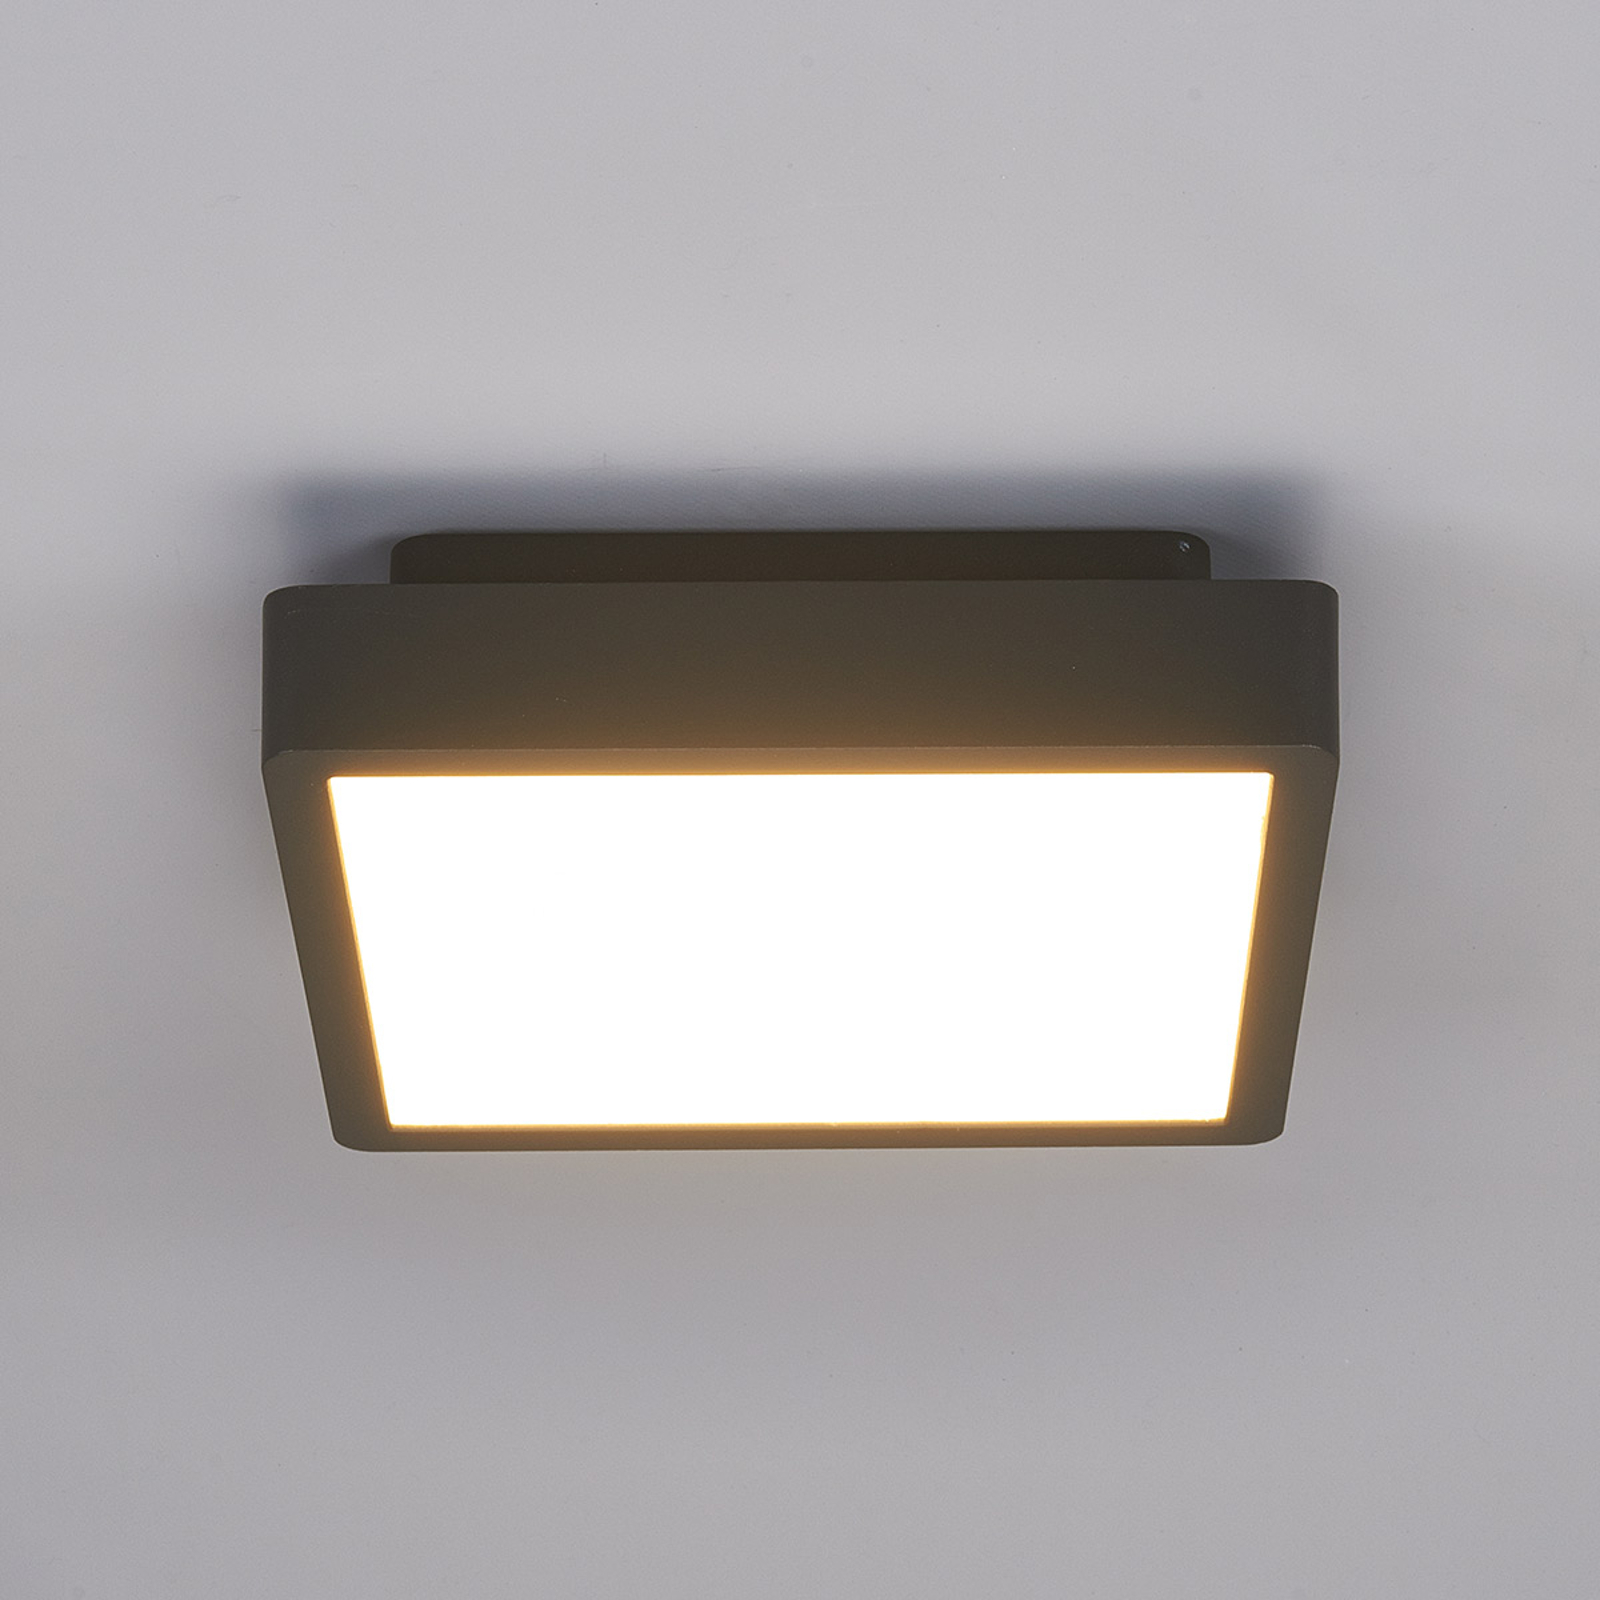 Rectangular LED outdoor ceiling light Talea_9616049_1